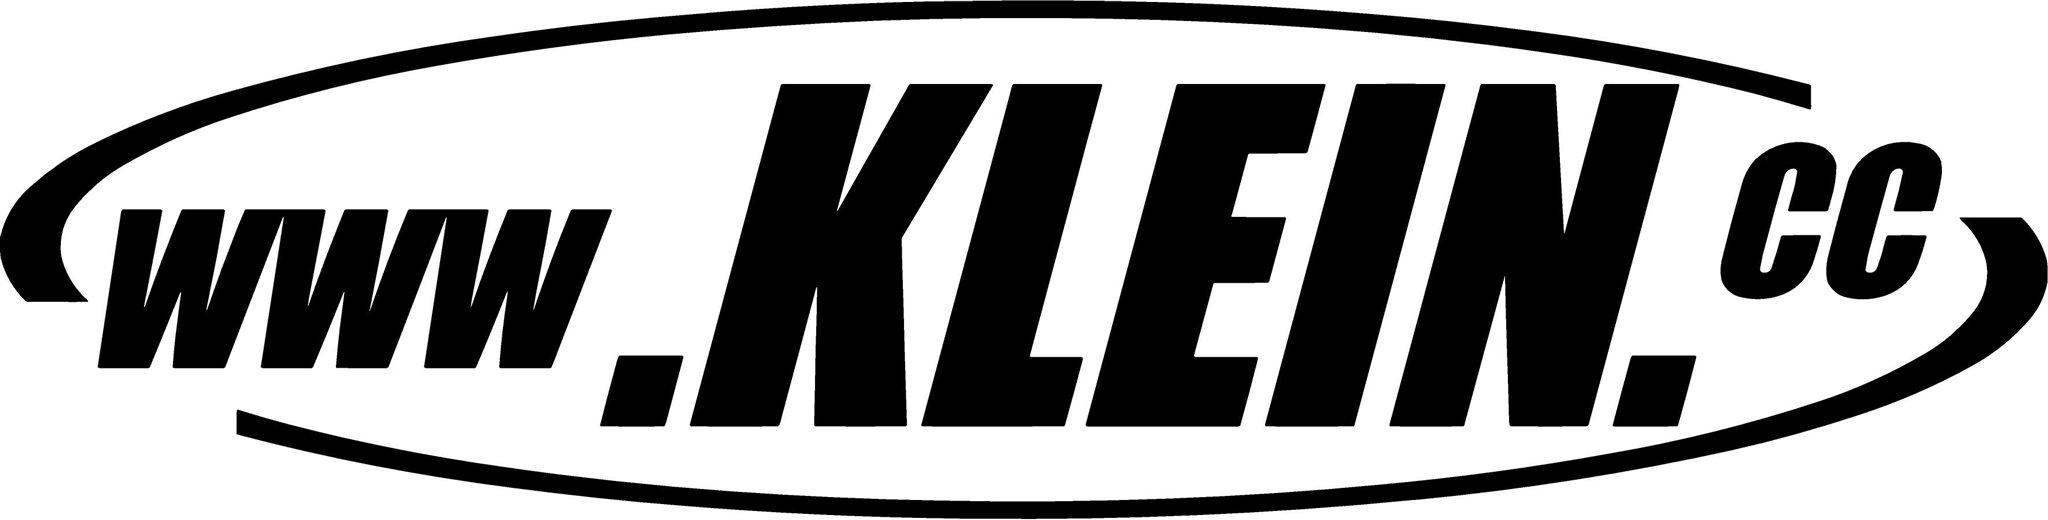 Motorrad Klein GmbH Logo